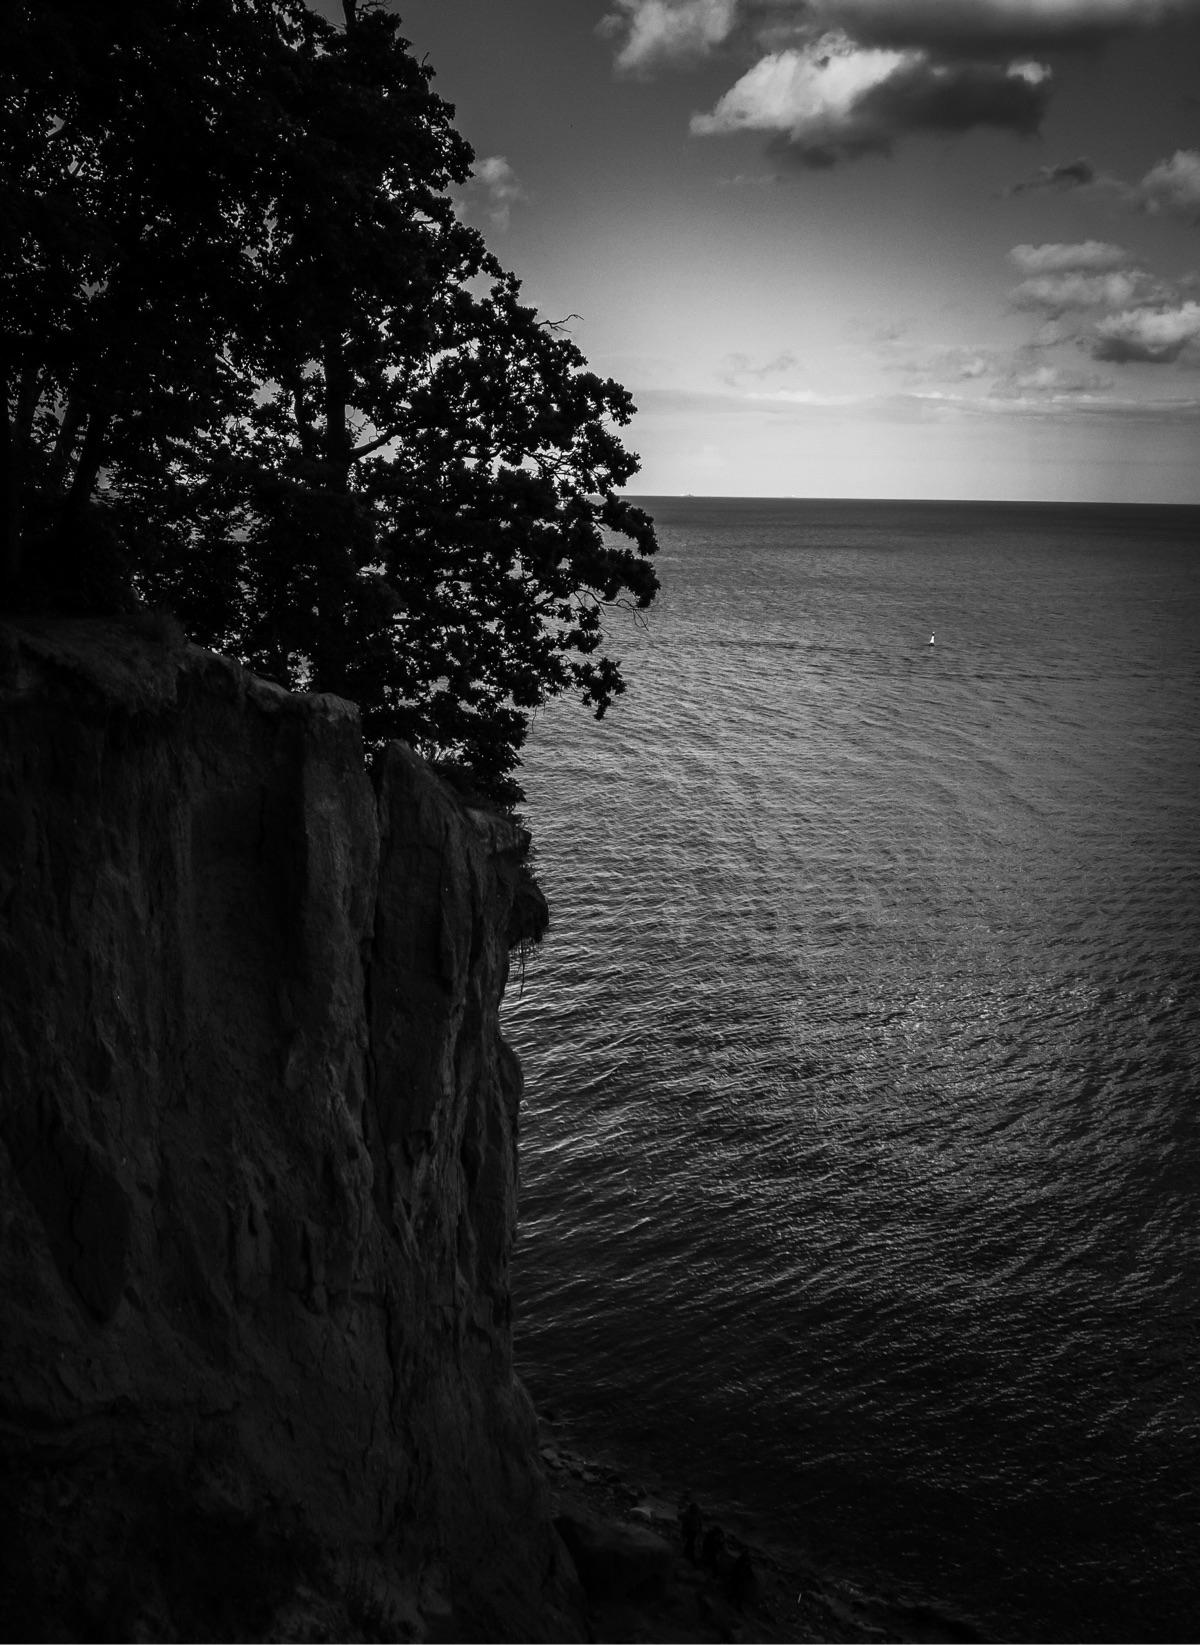 Baltic sea - amateur, iphone, black_and_white - motyl   ello